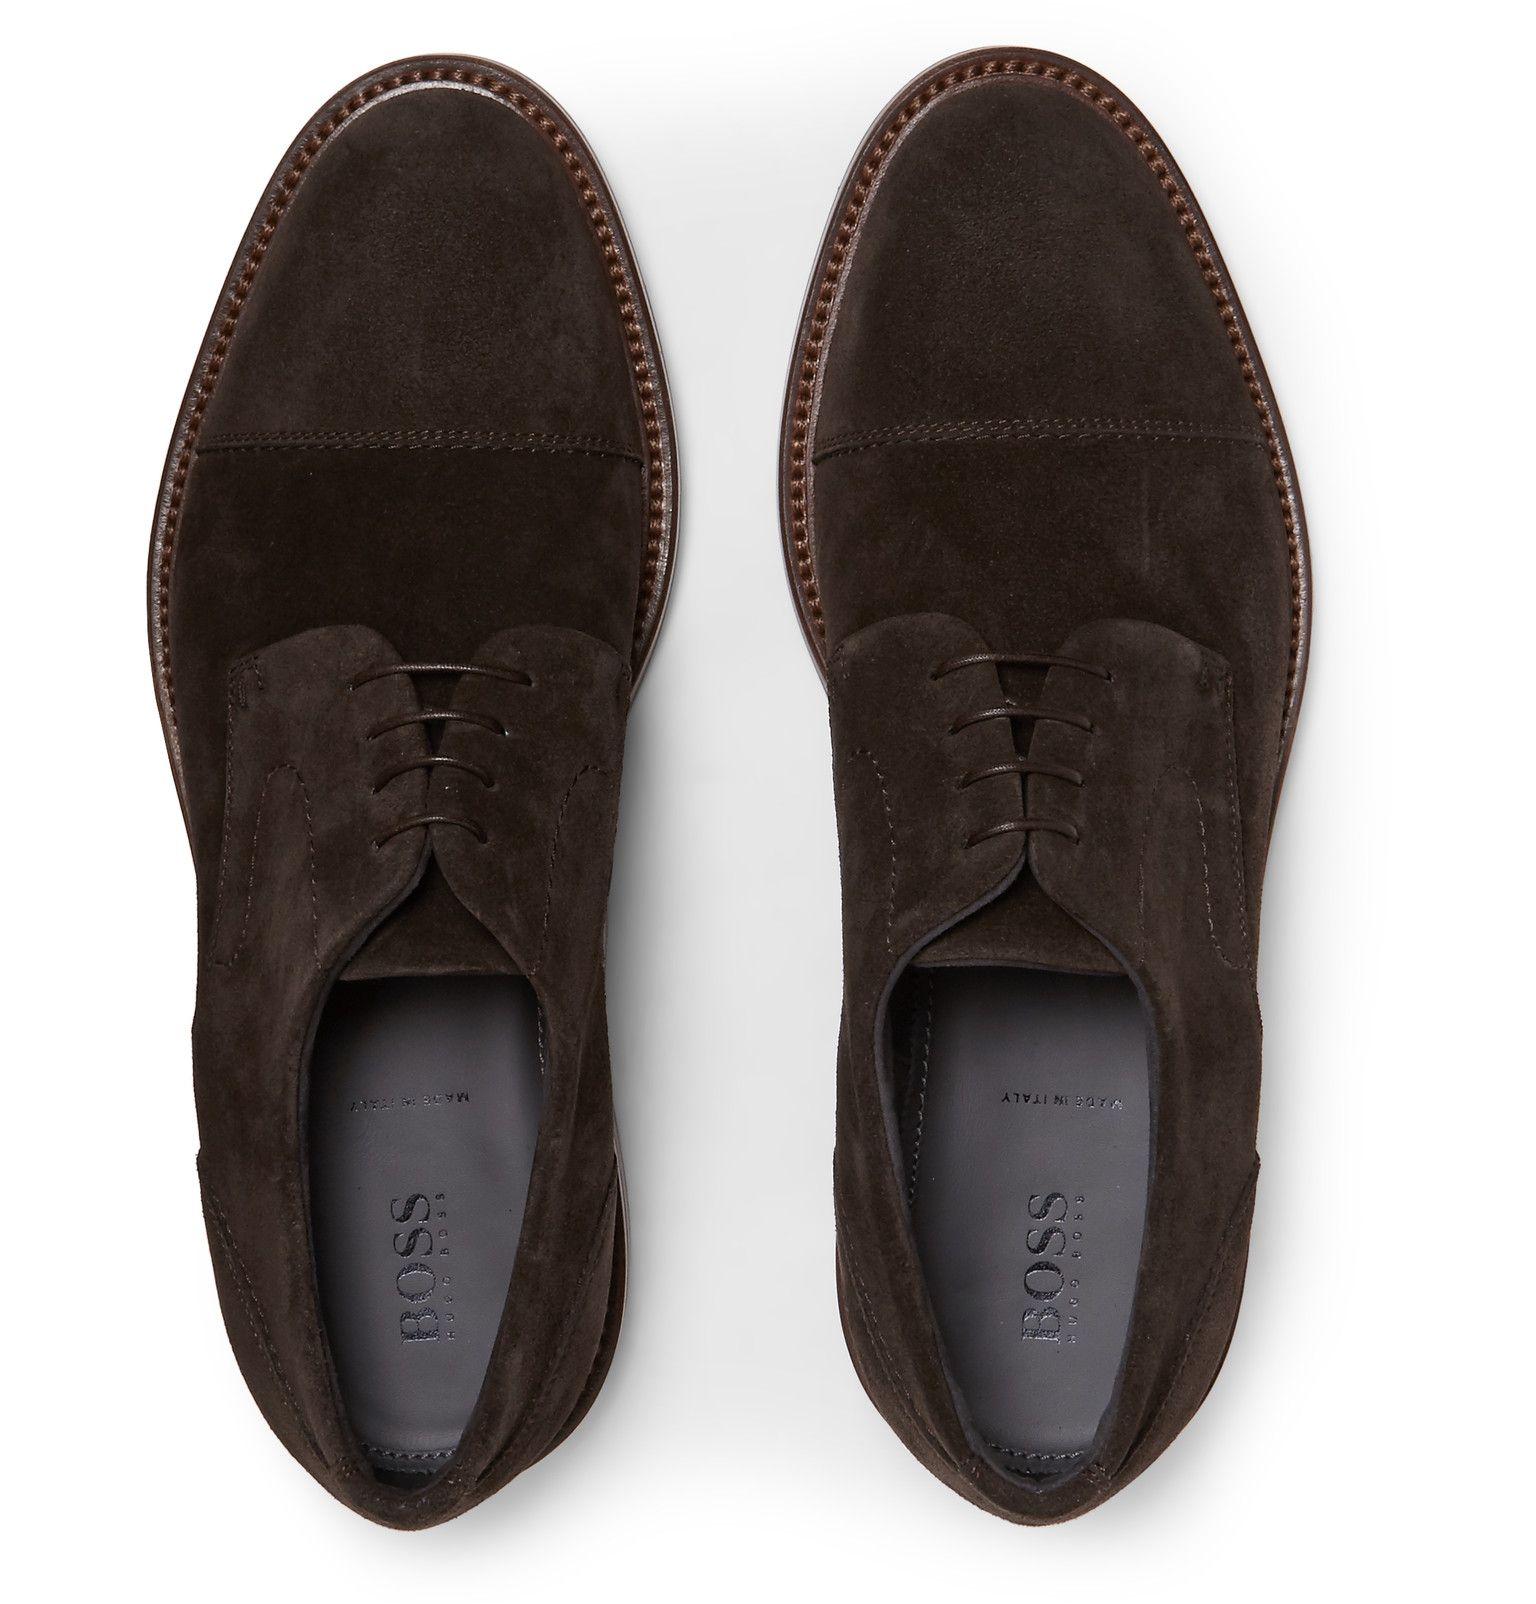 HUGO BOSS Suede Derby Shoes | Derby